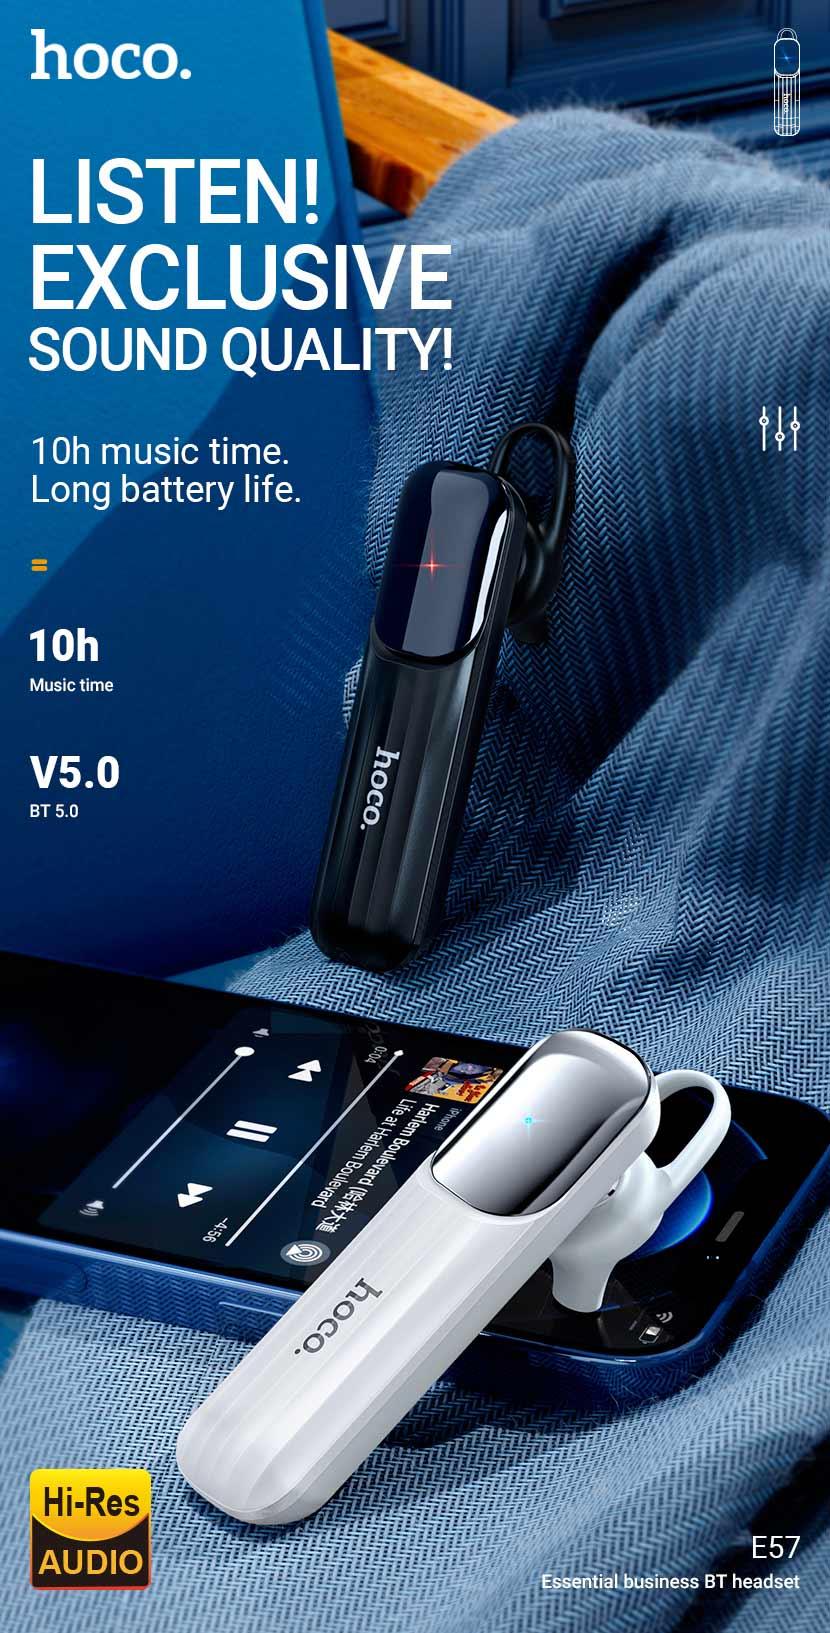 hoco news e57 essential business bt headset en